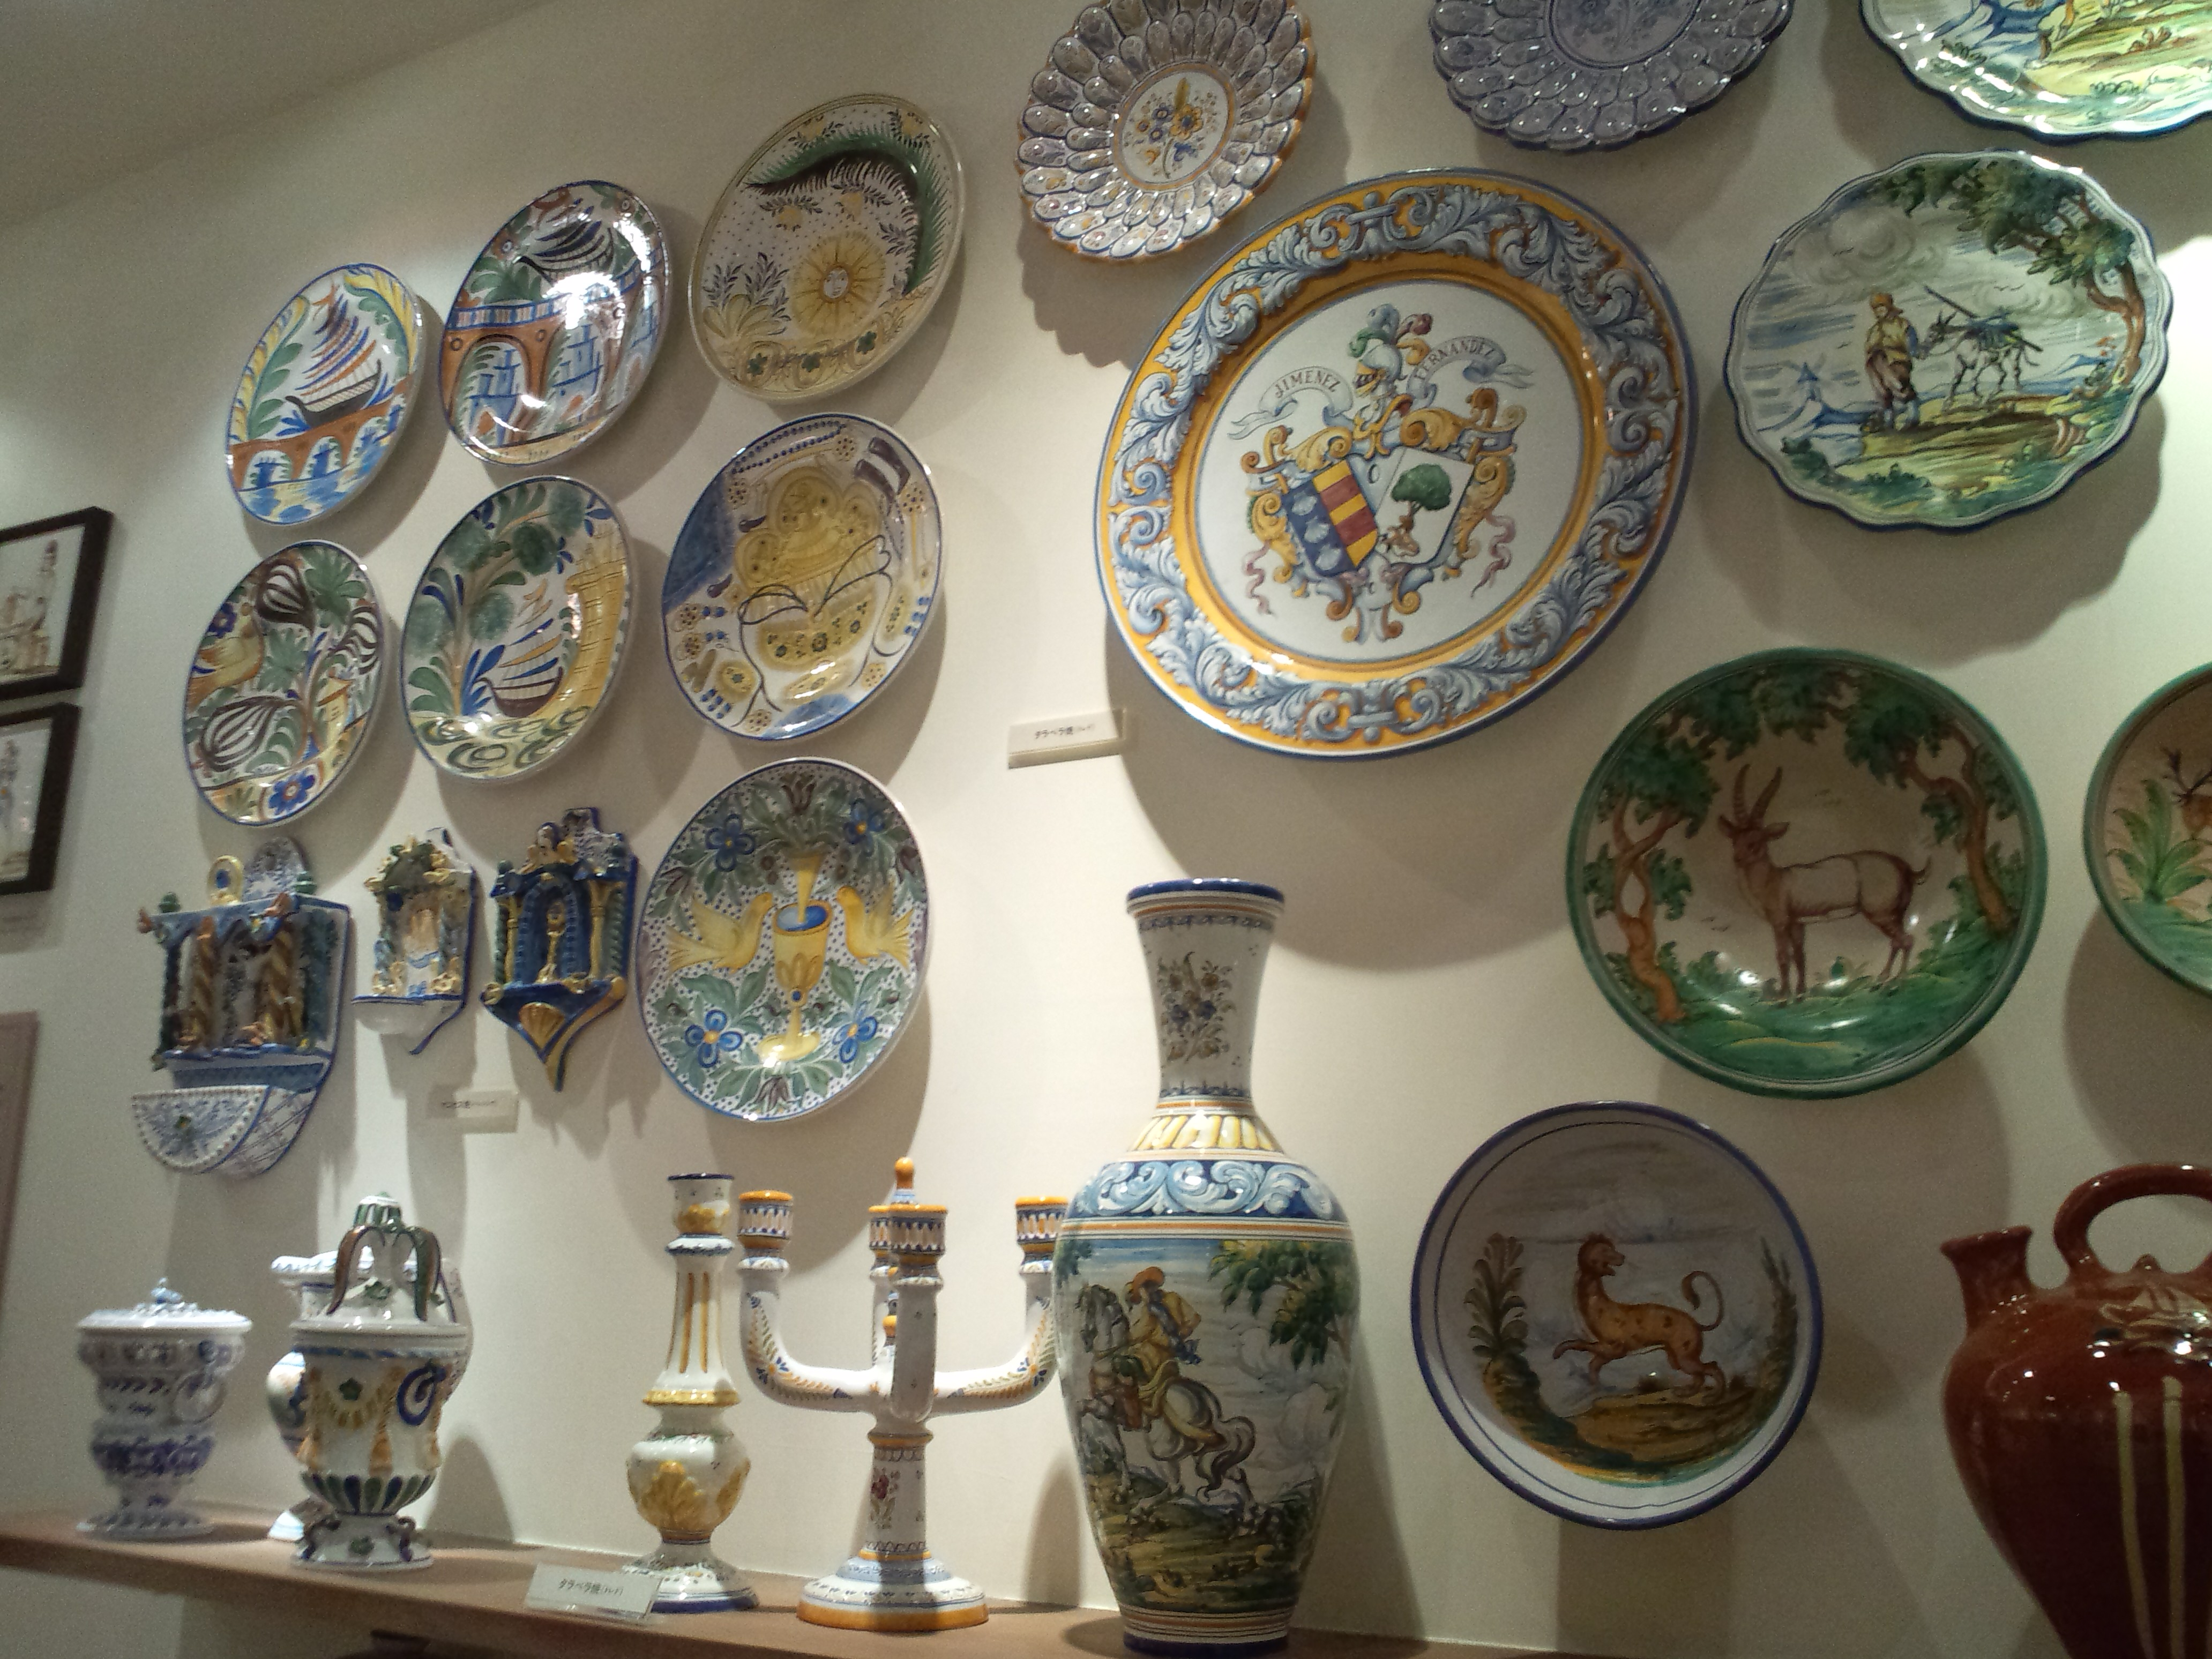 La villa espa ola de shima parque espa a museo for Ceramica talavera madrid